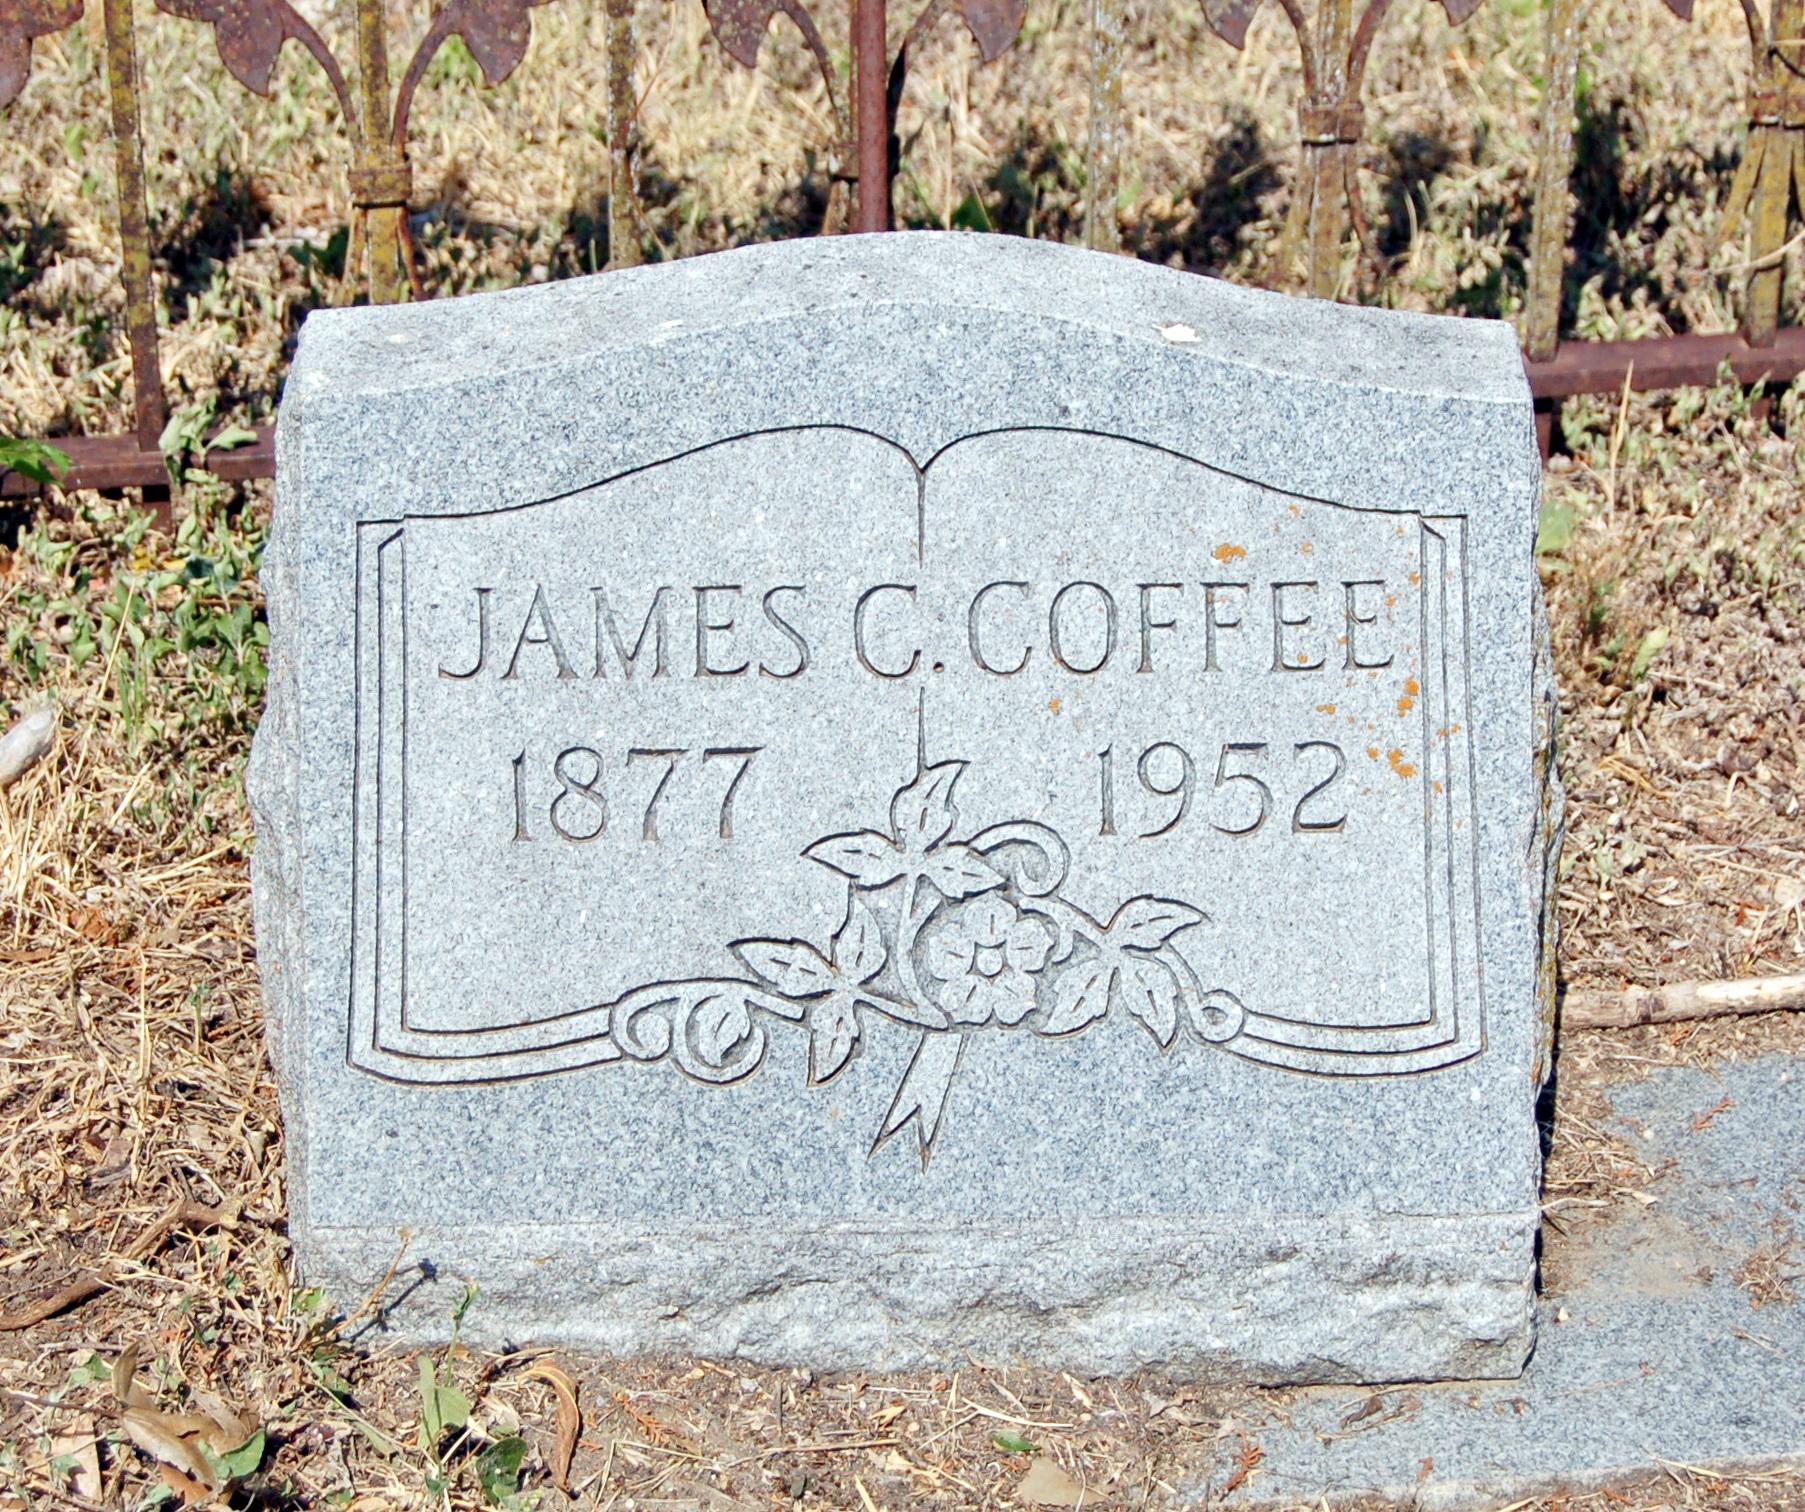 James C. Coffee